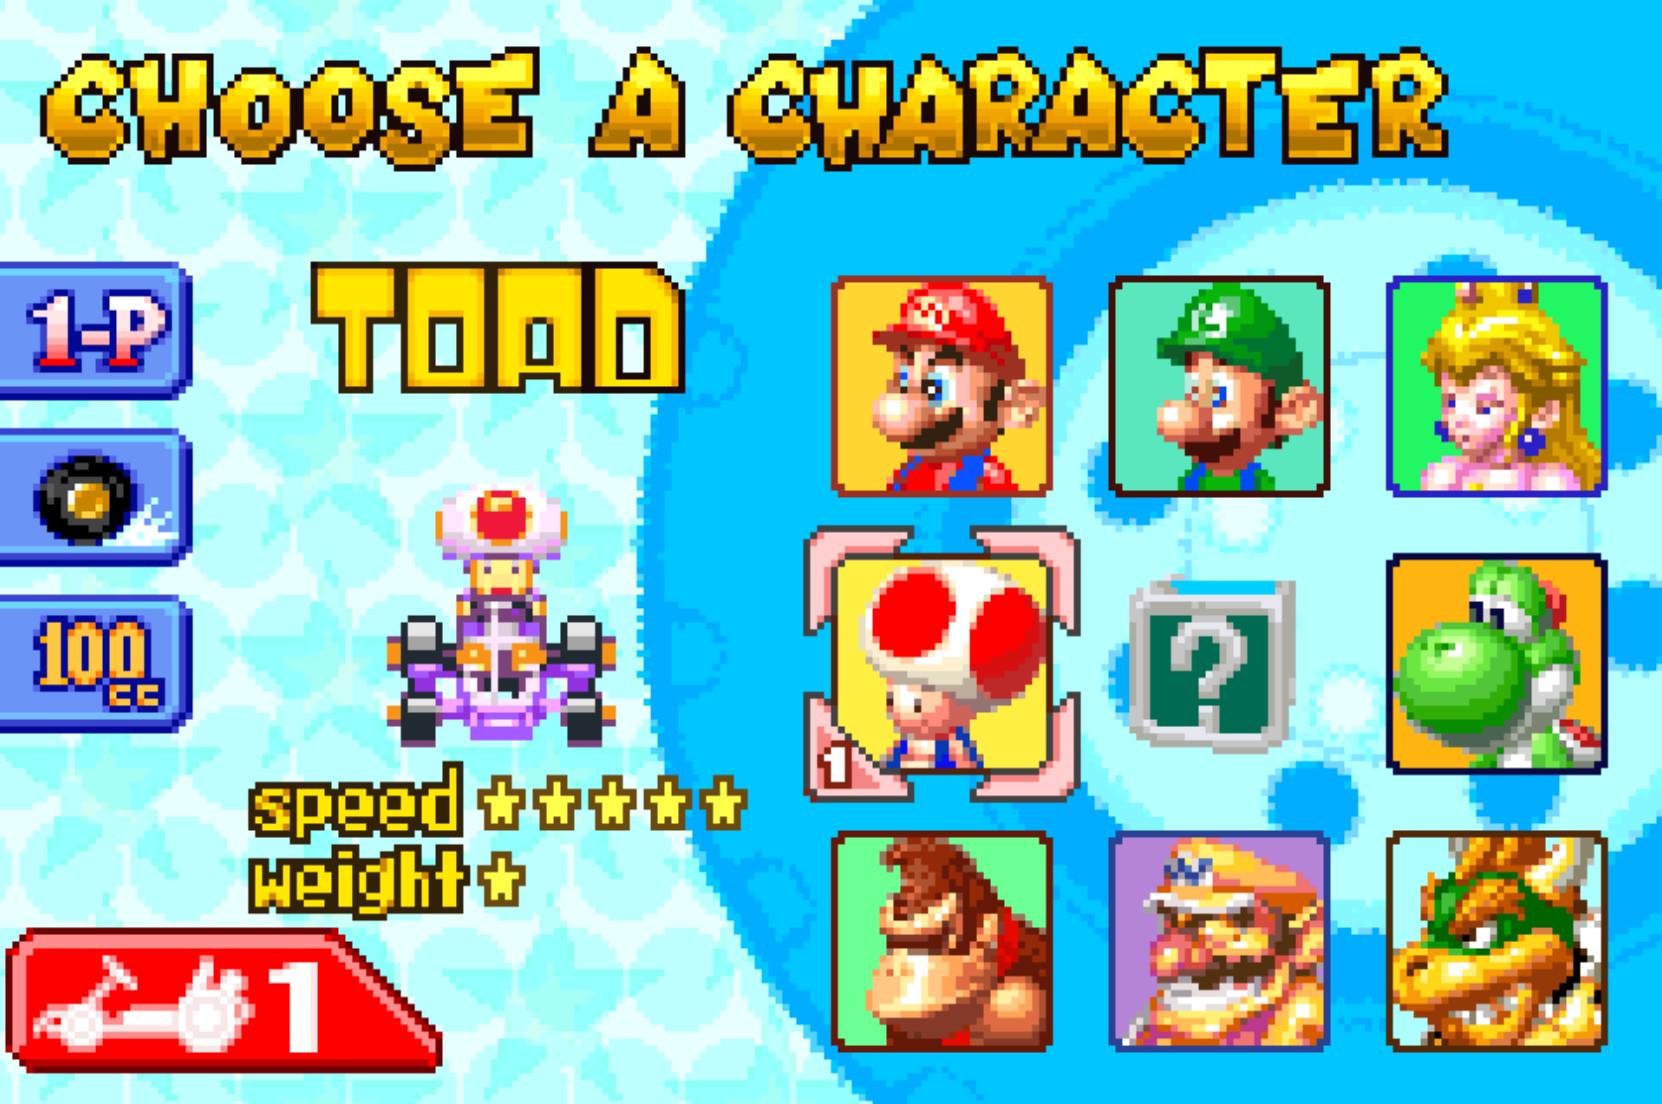 Choose A Character